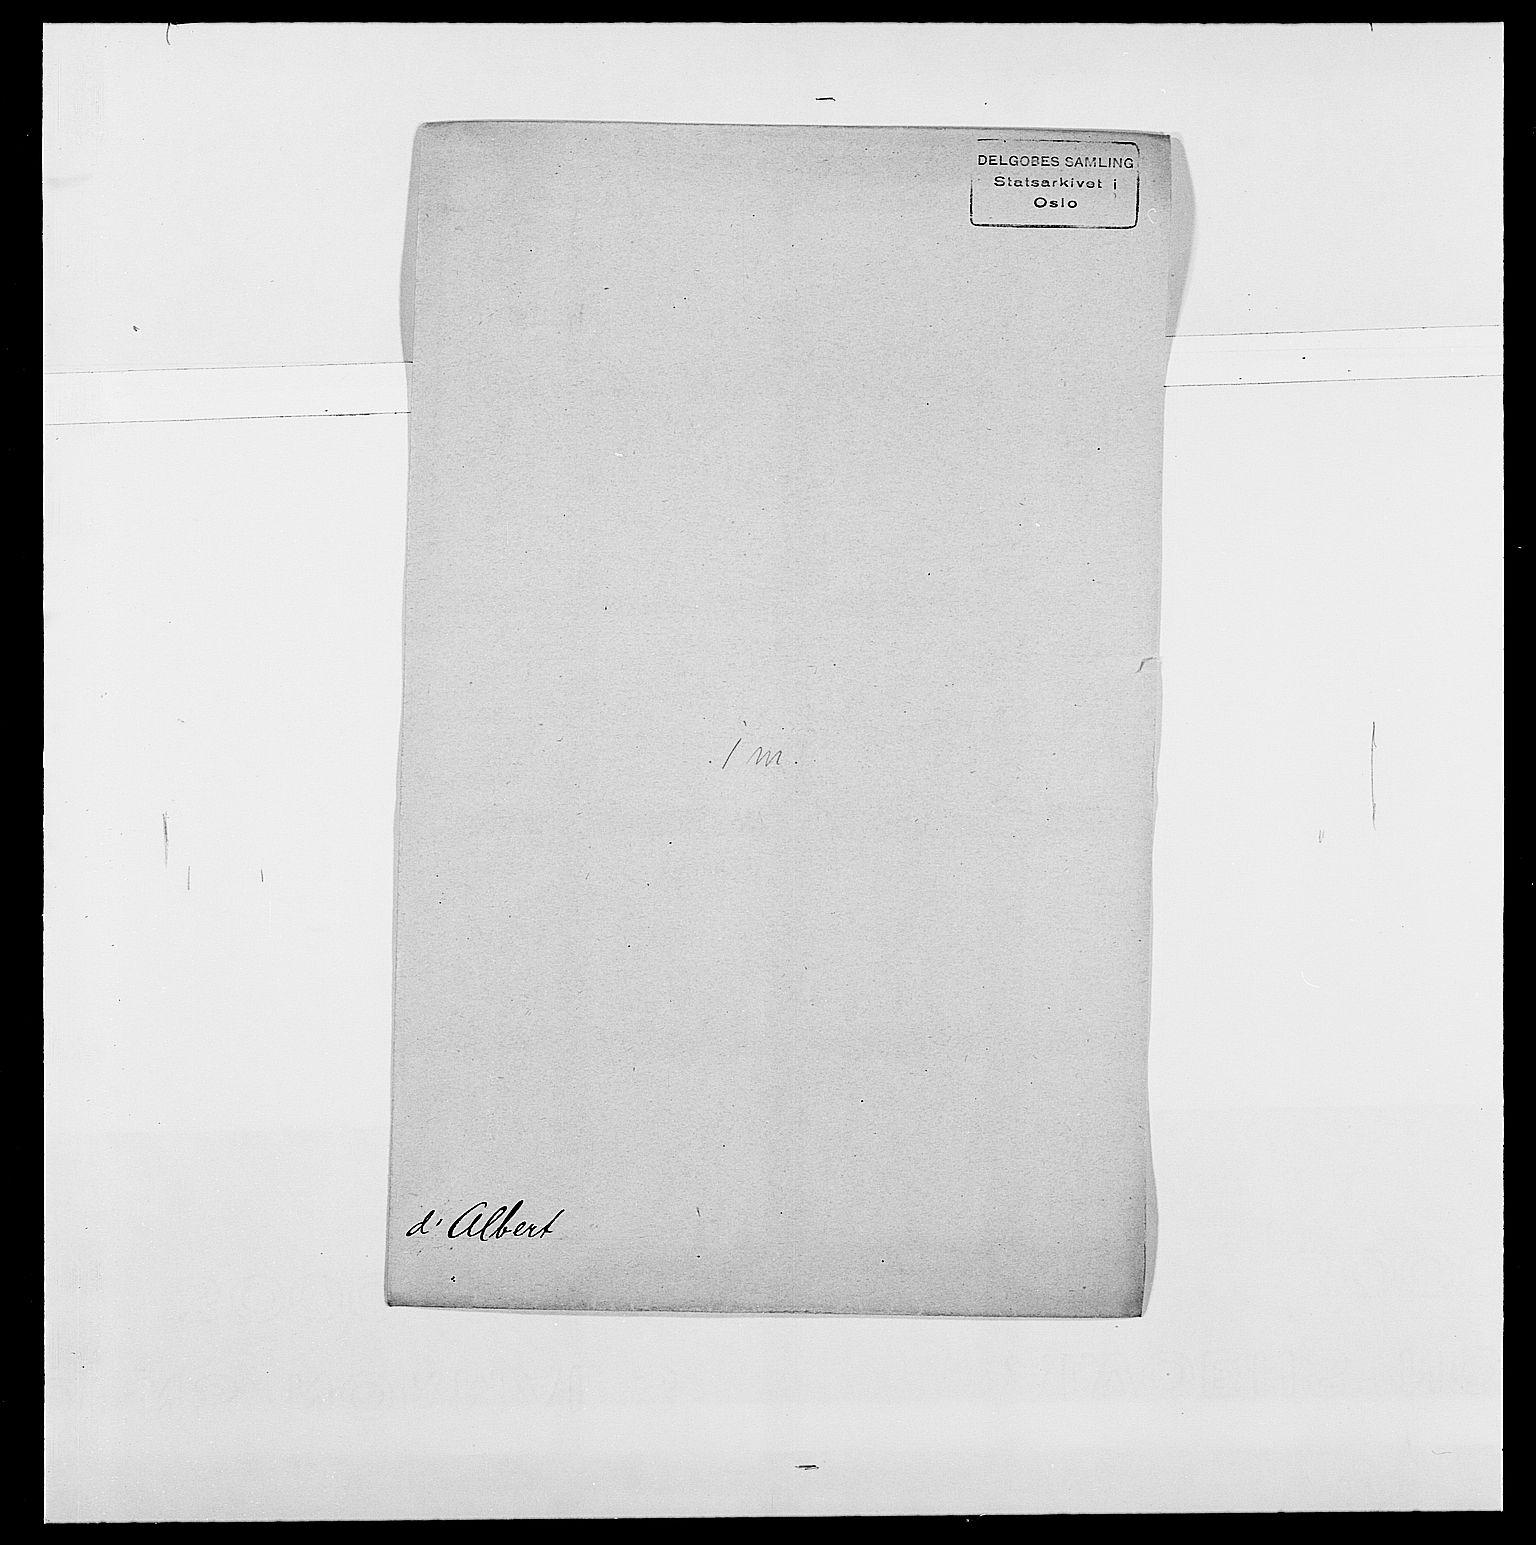 SAO, Delgobe, Charles Antoine - samling, D/Da/L0001: Aabye - Angerman, s. 365